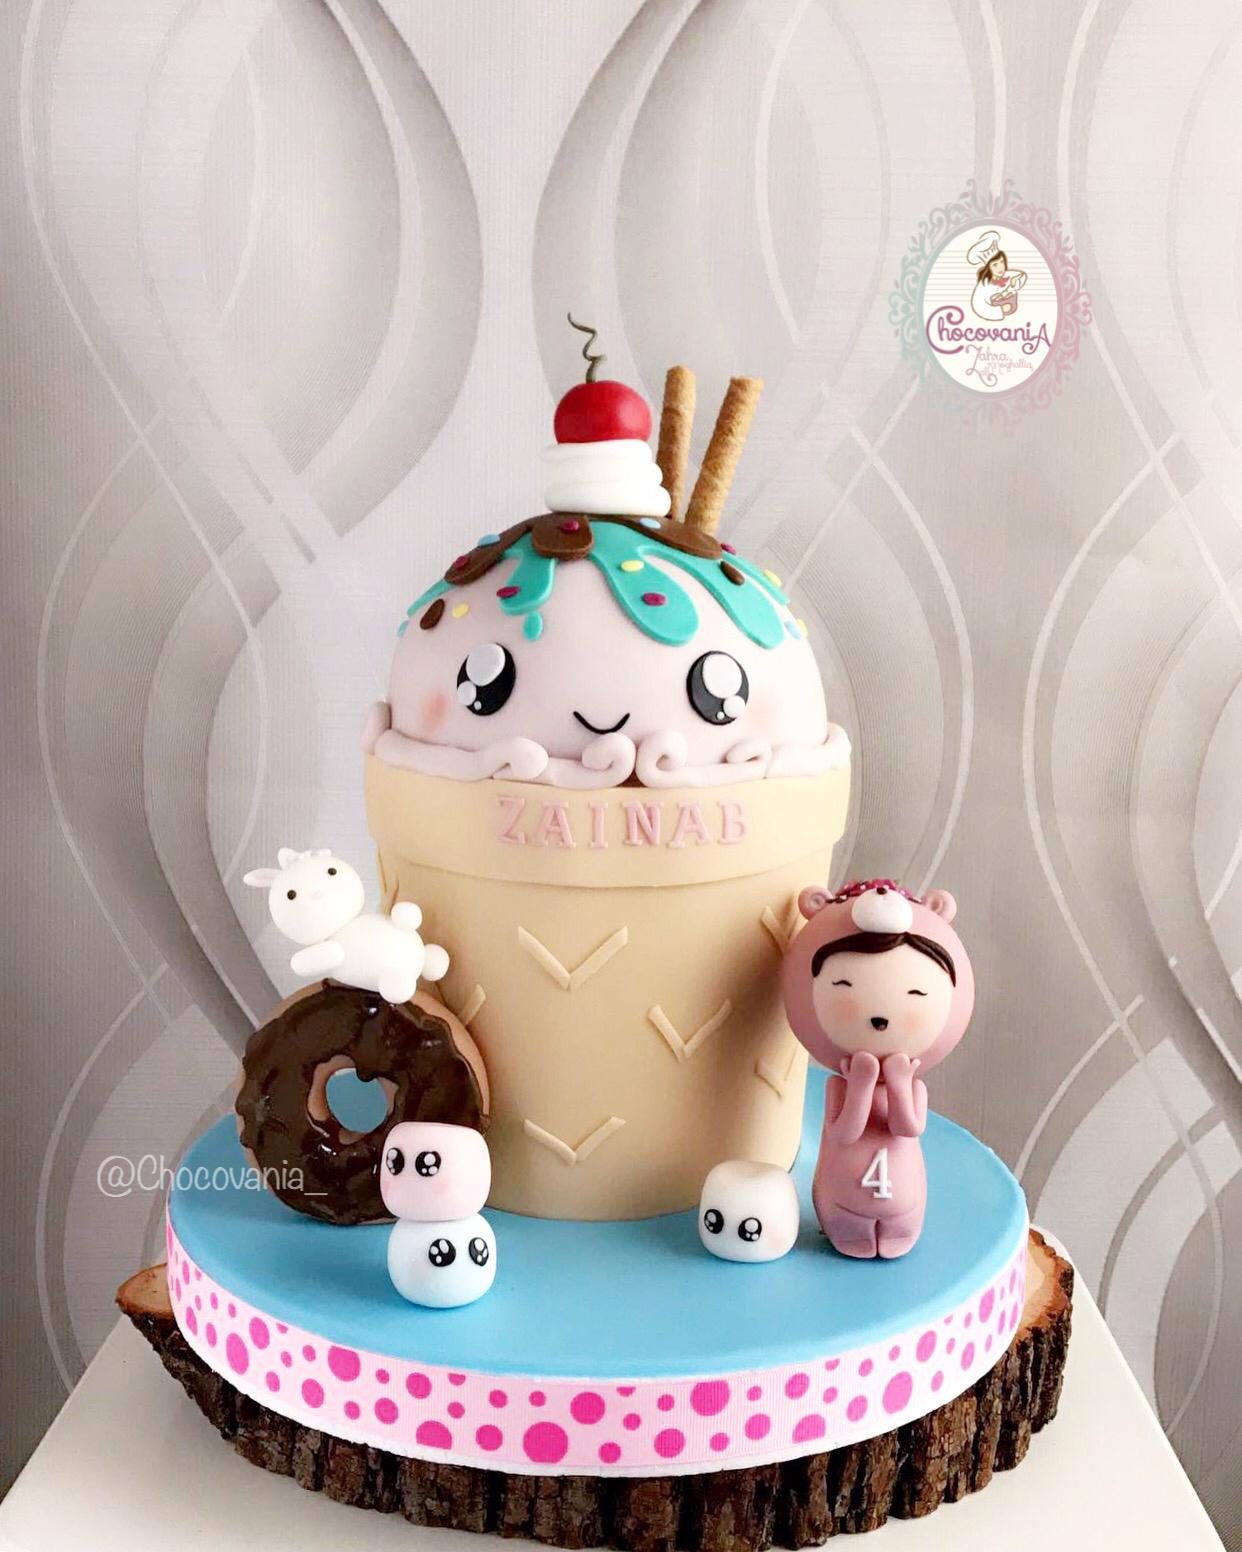 Ice Cream and sweets fondant birthday cake